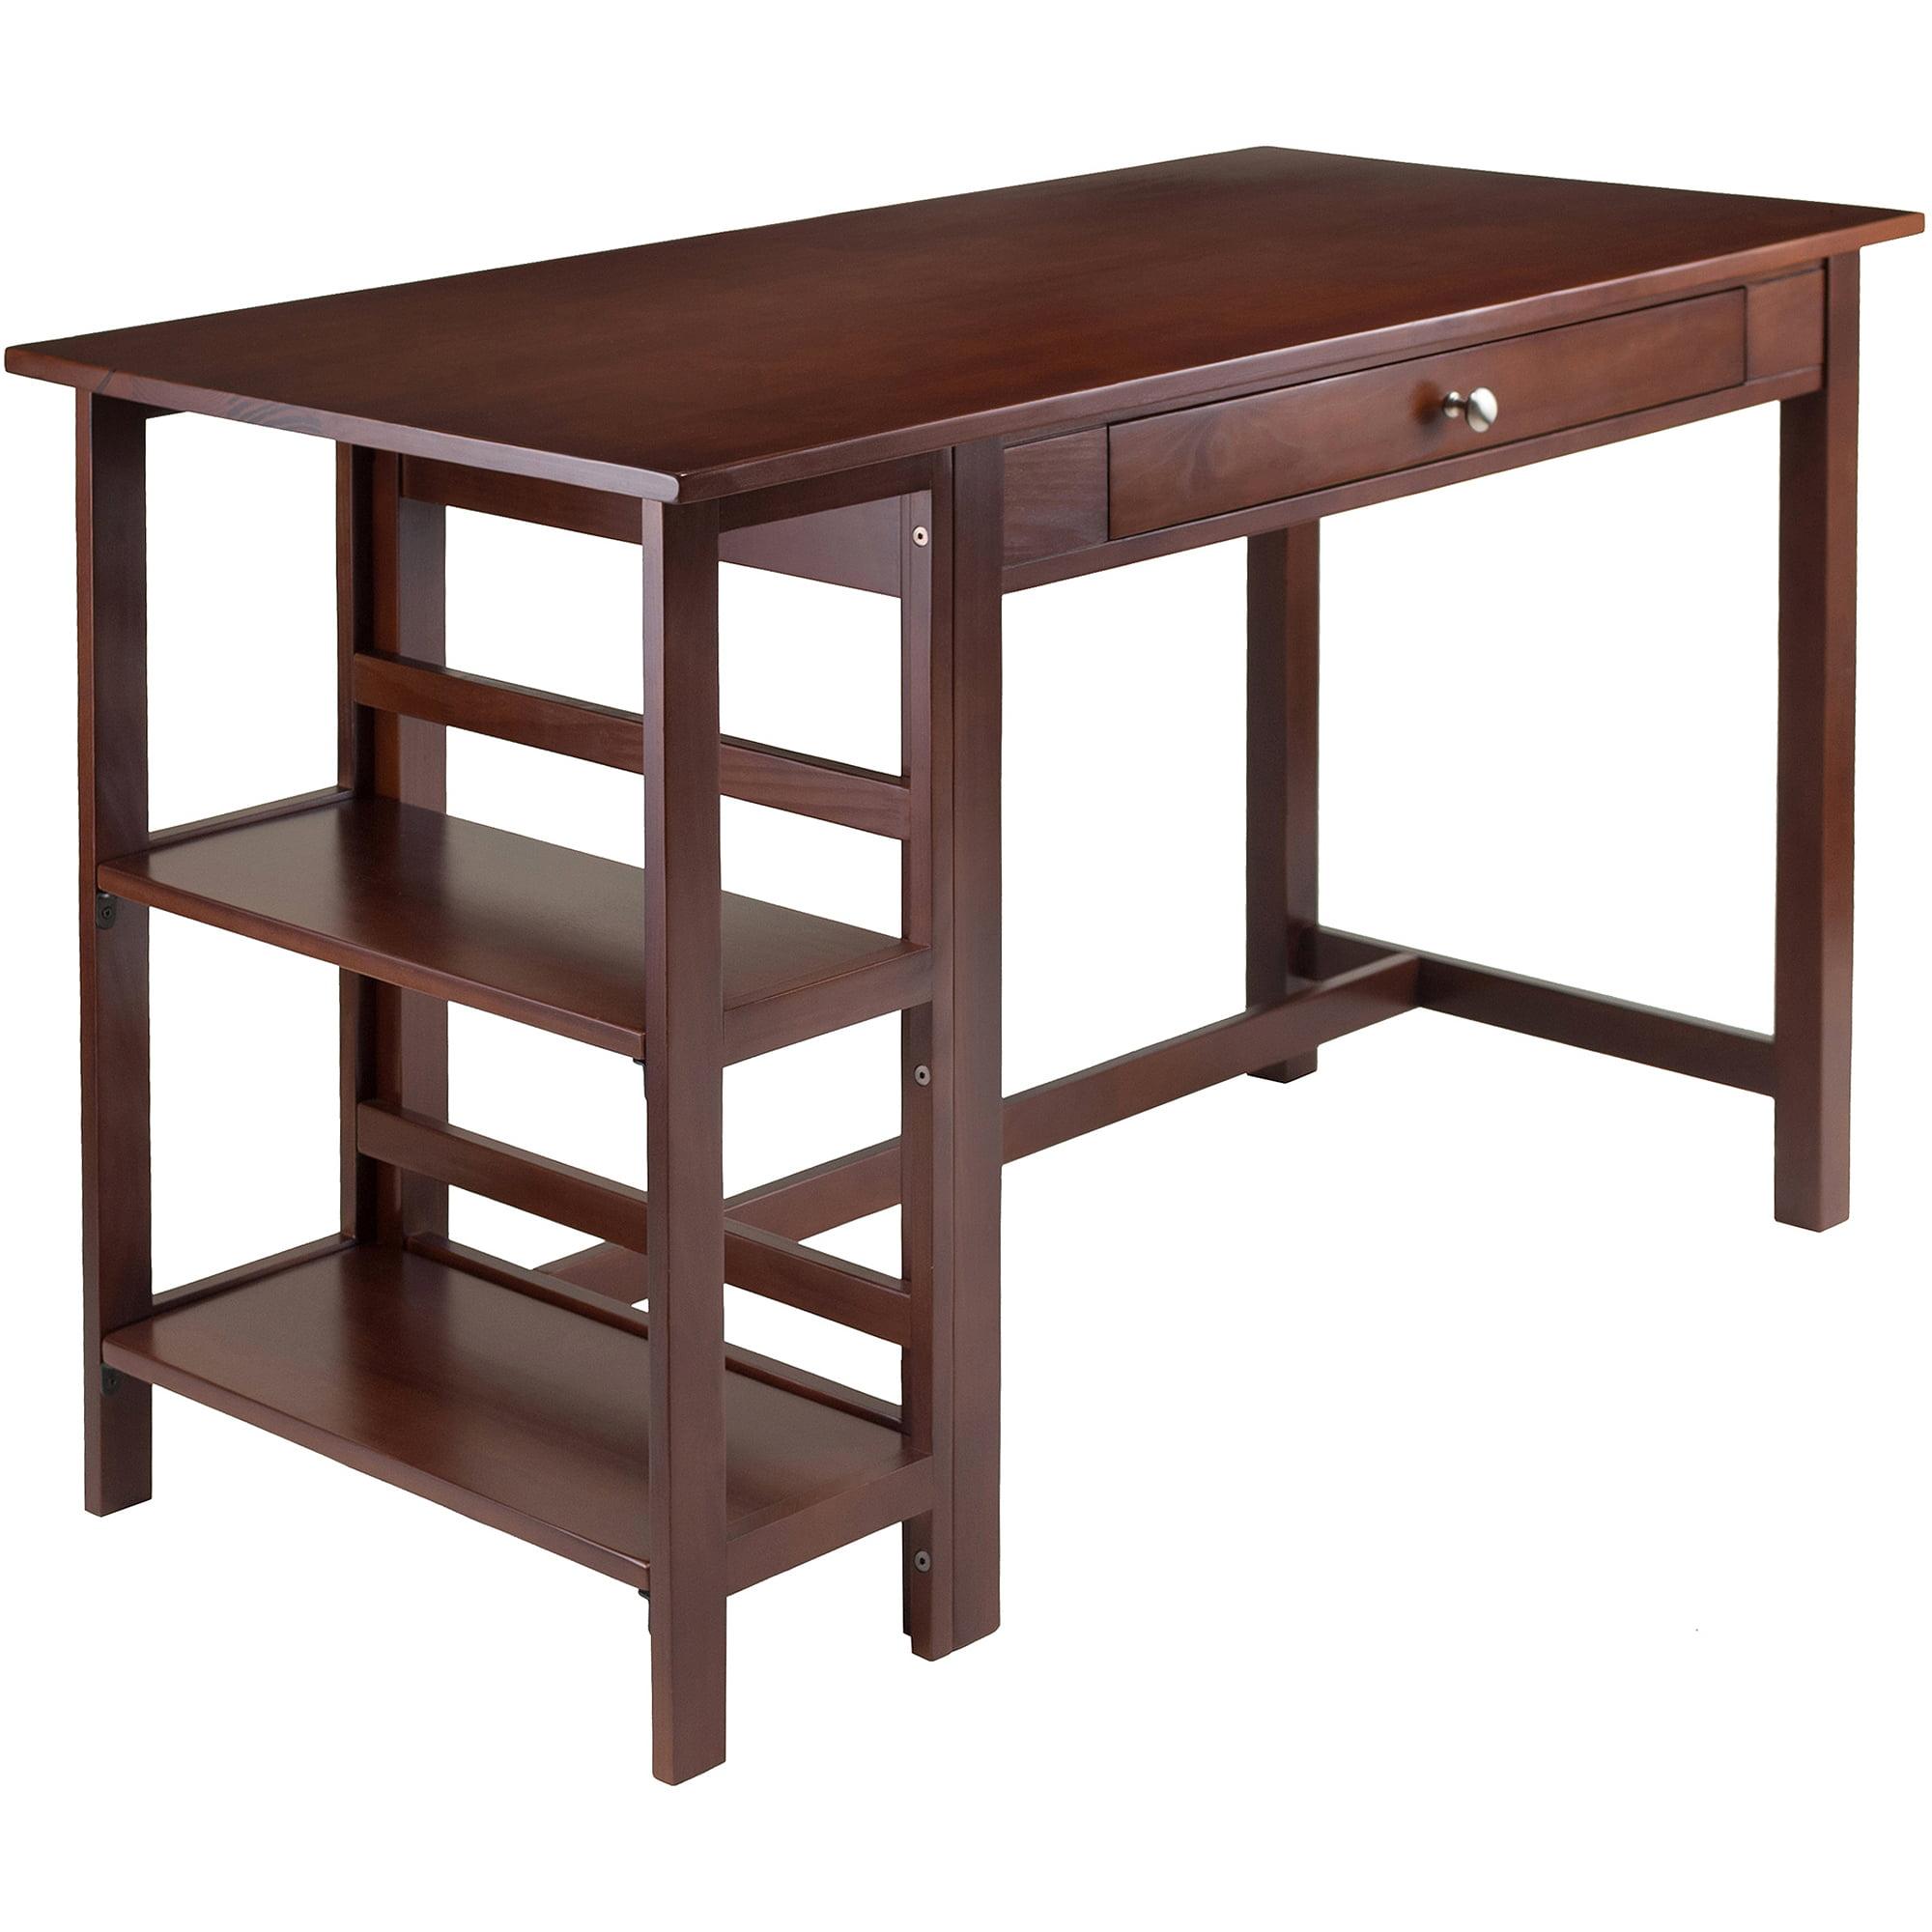 Velda Writing Desk with 2 Shelves, Walnut